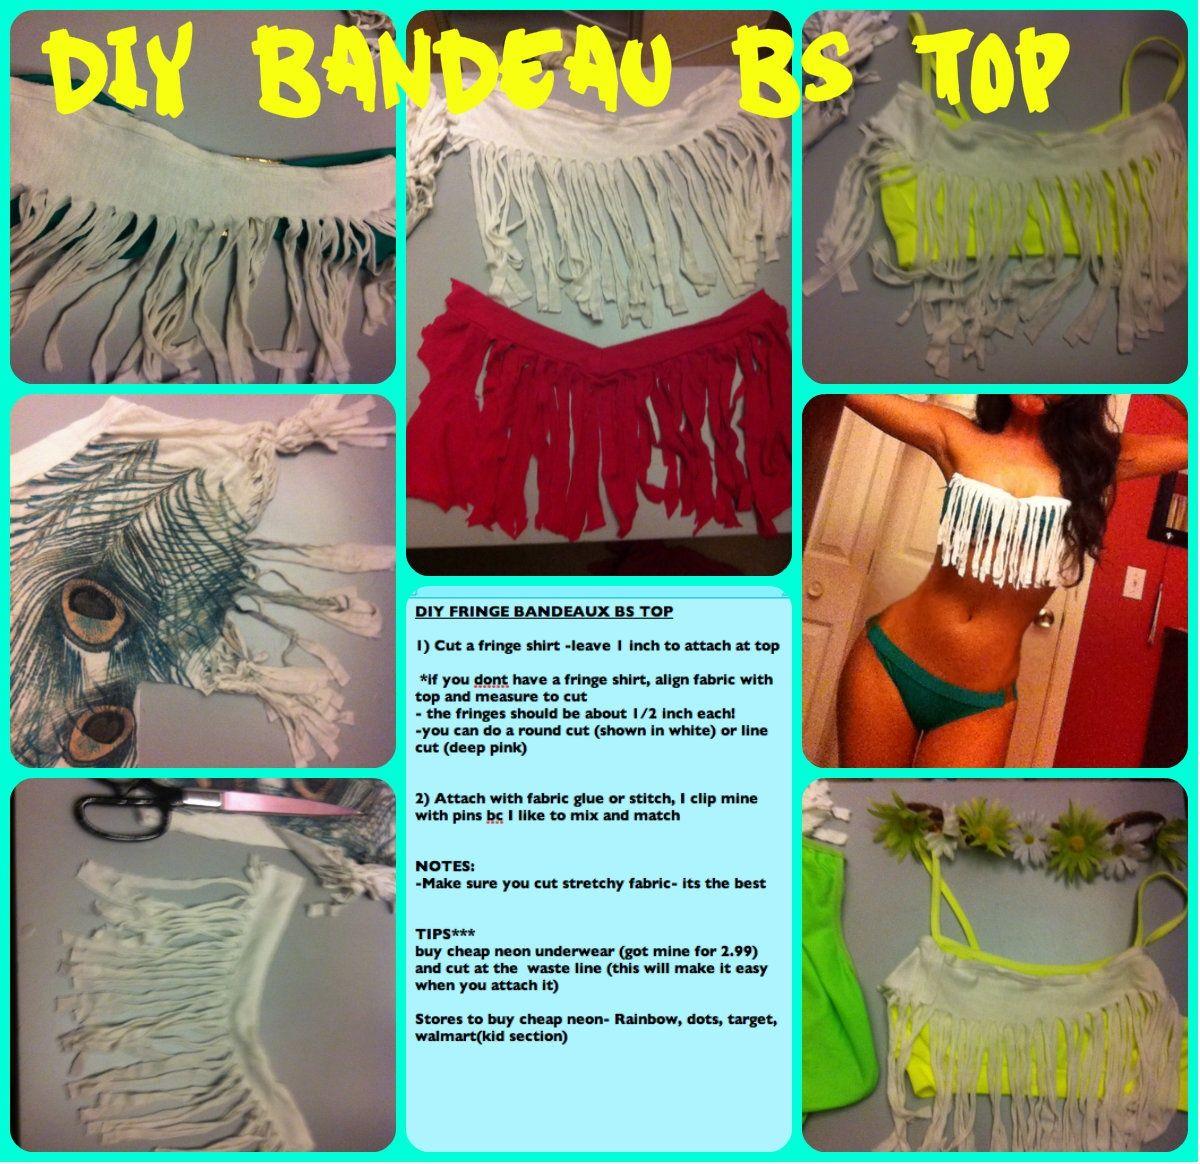 diy bathing suit alterations